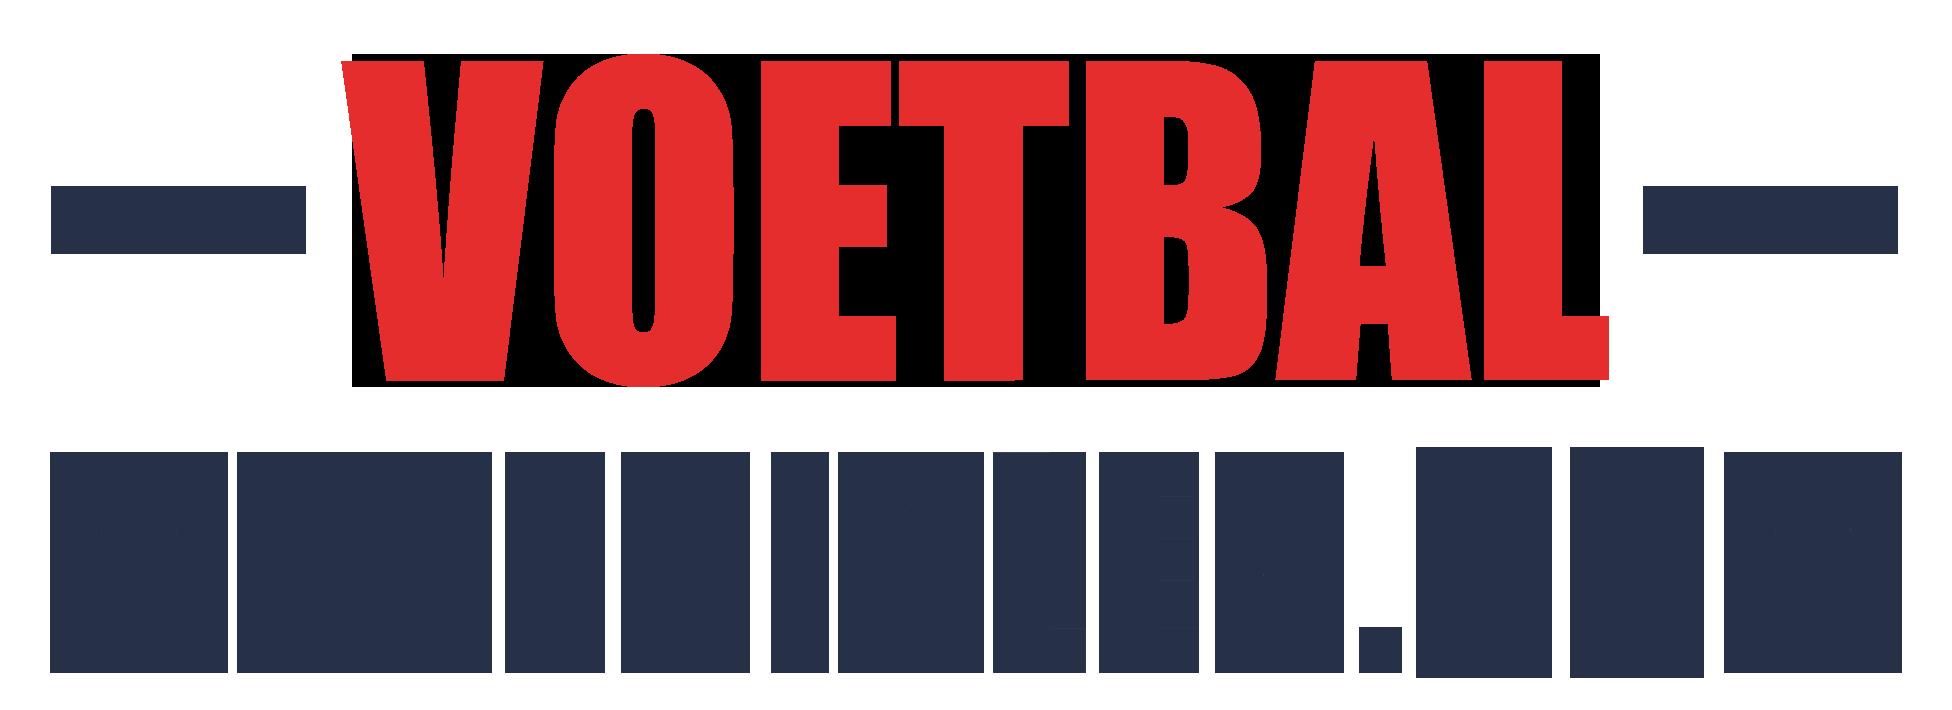 Voetbal-materialen.nl